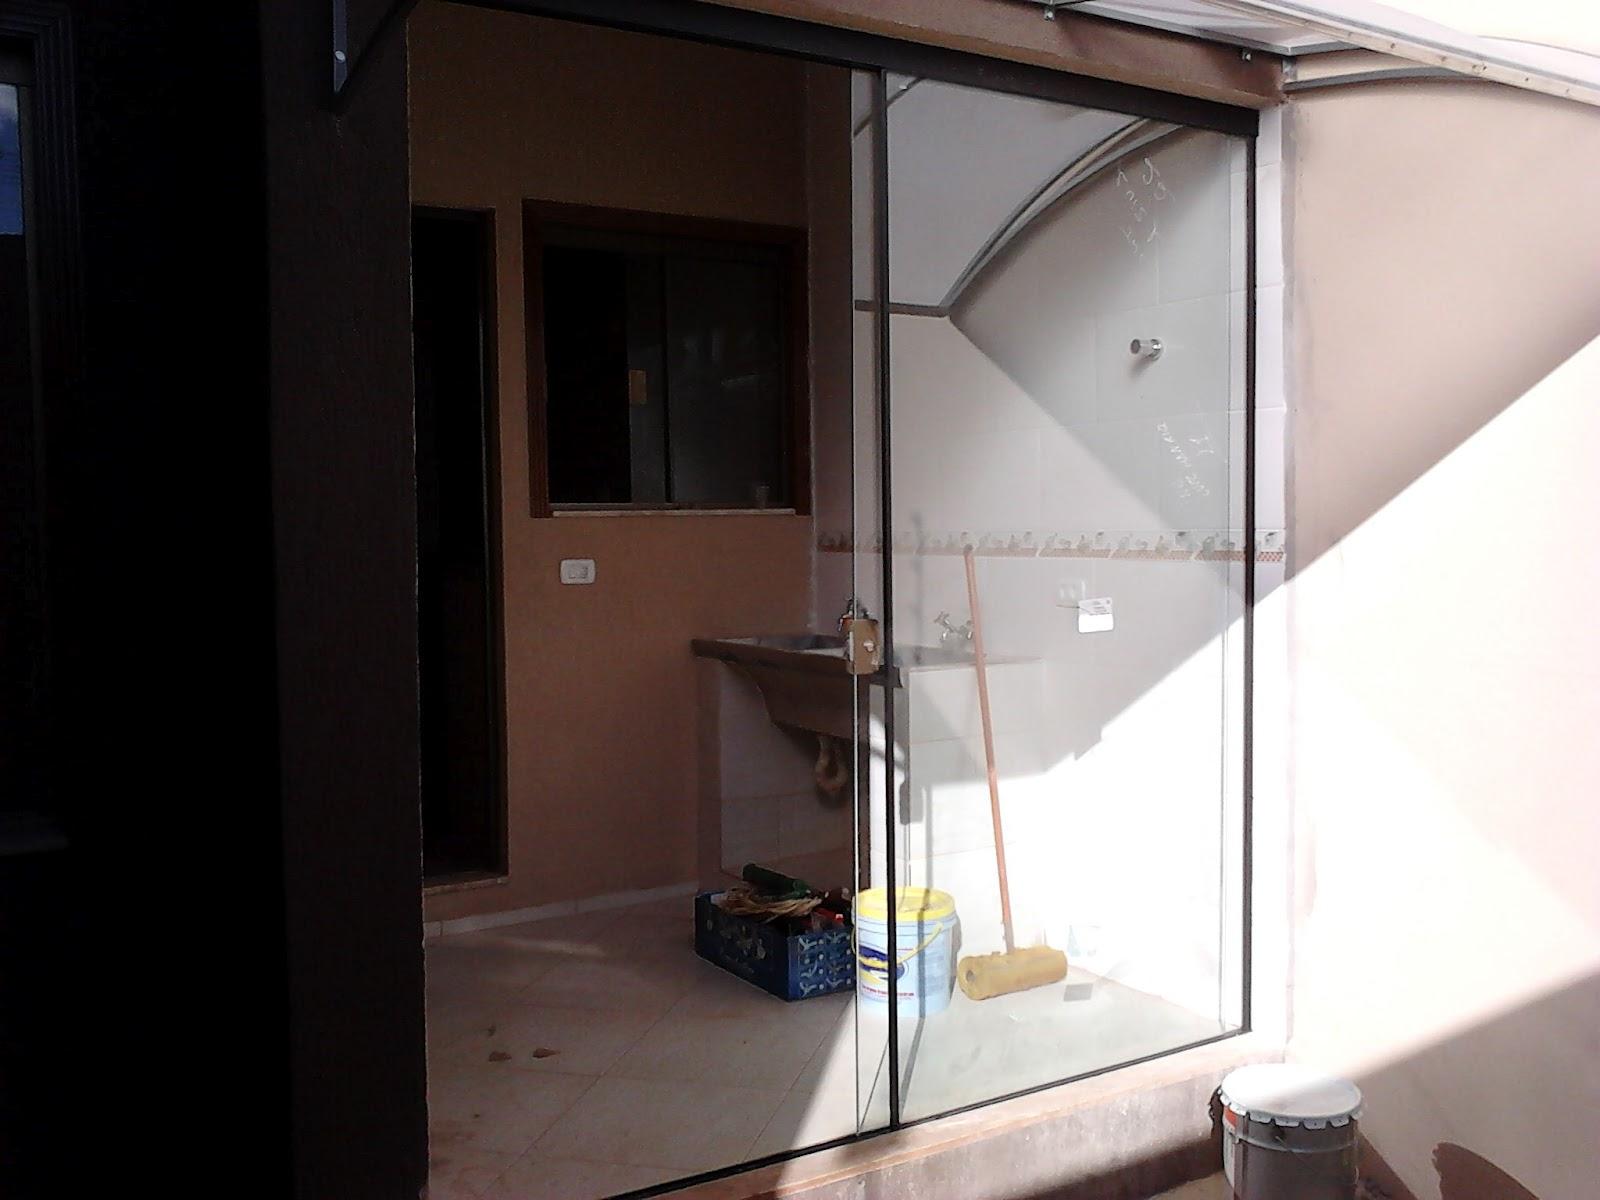 #343F60 FRANCO VIDROS TEMPERADOS: Fevereiro 2012 226 Janelas De Vidro Para Lavanderia